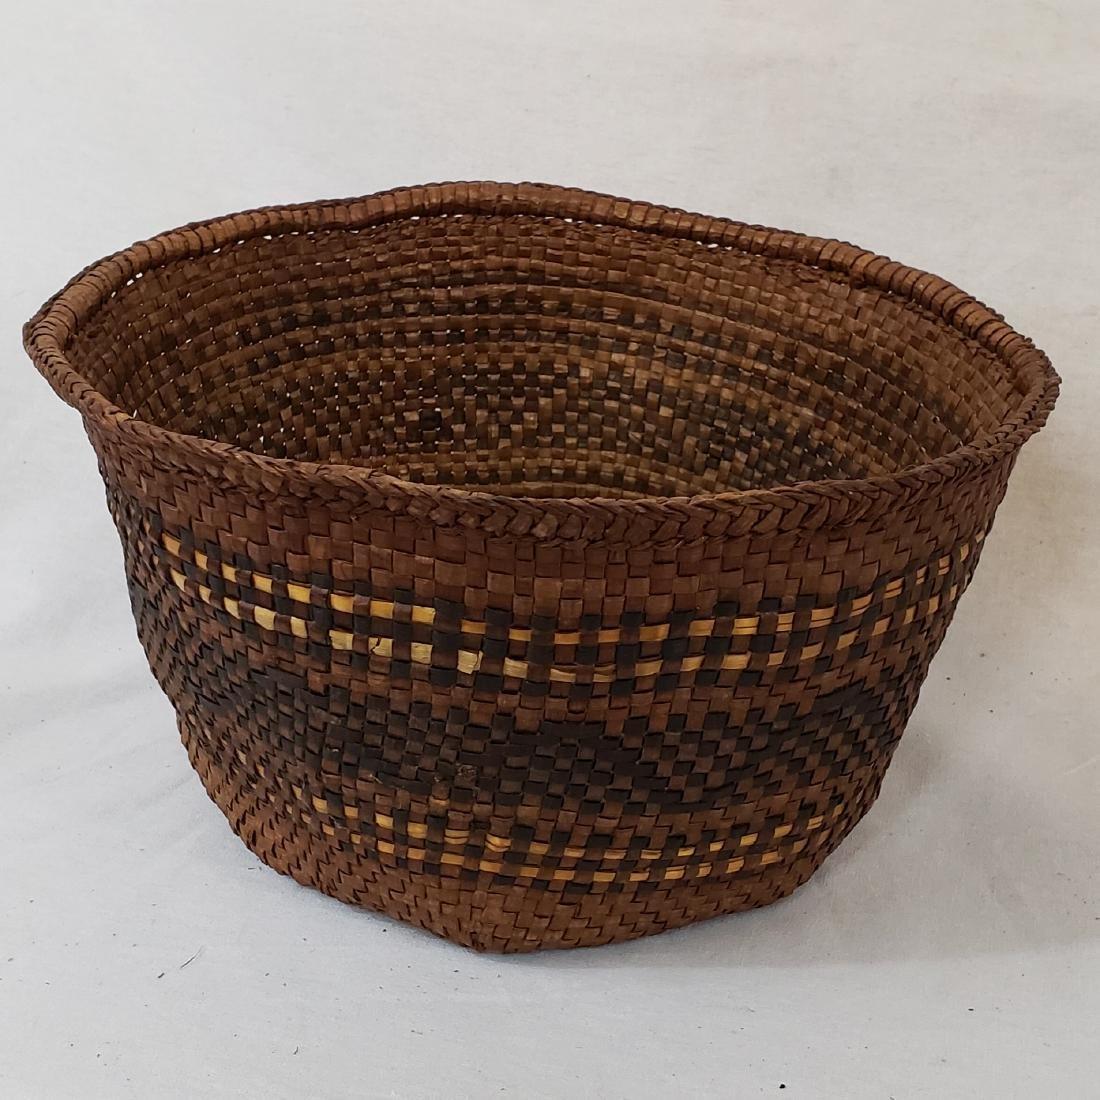 Woven cedar bark Northwest coast Indian basket ca 1900